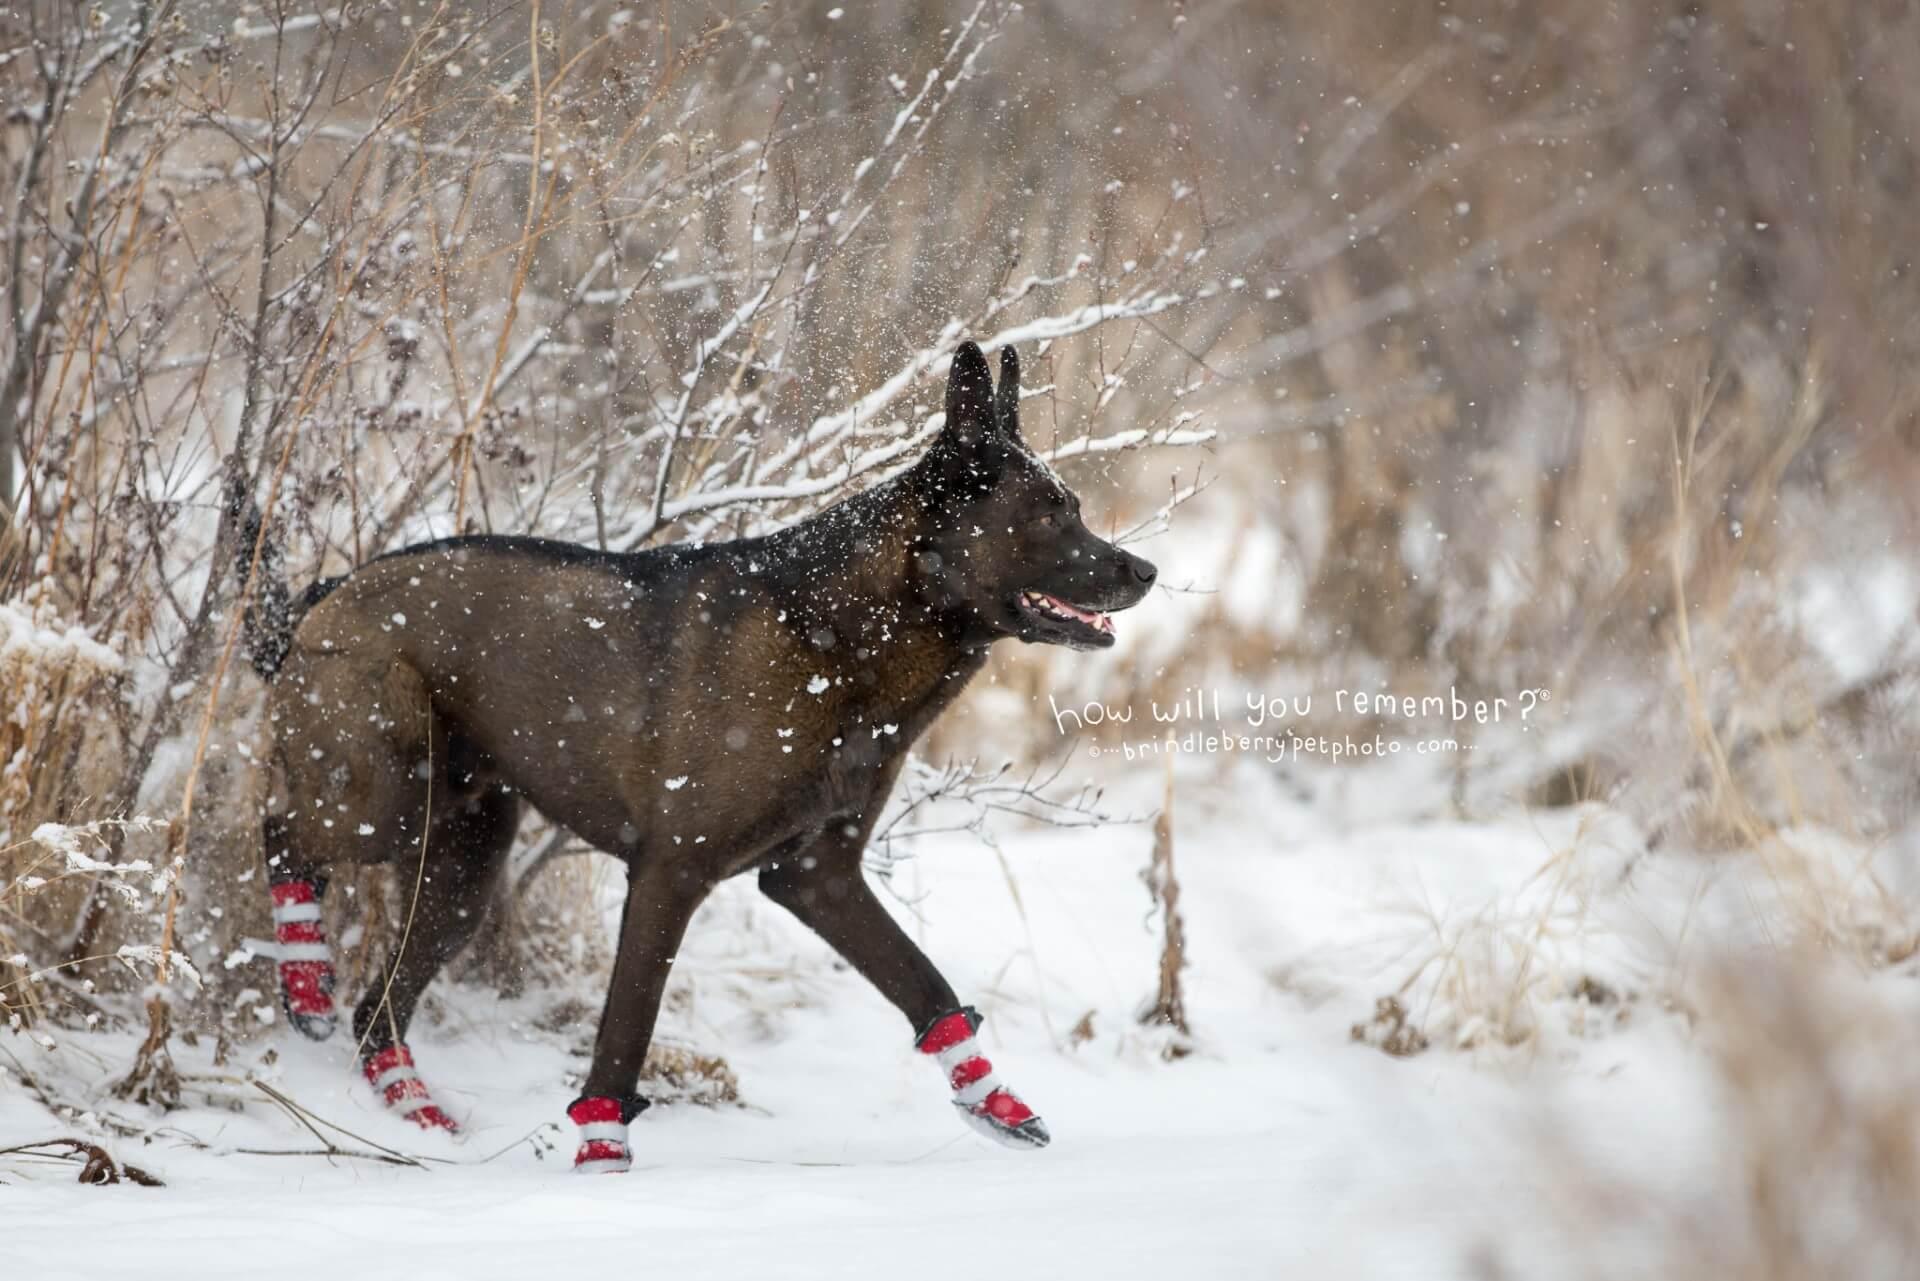 Shepherd dog in snow wearing boots